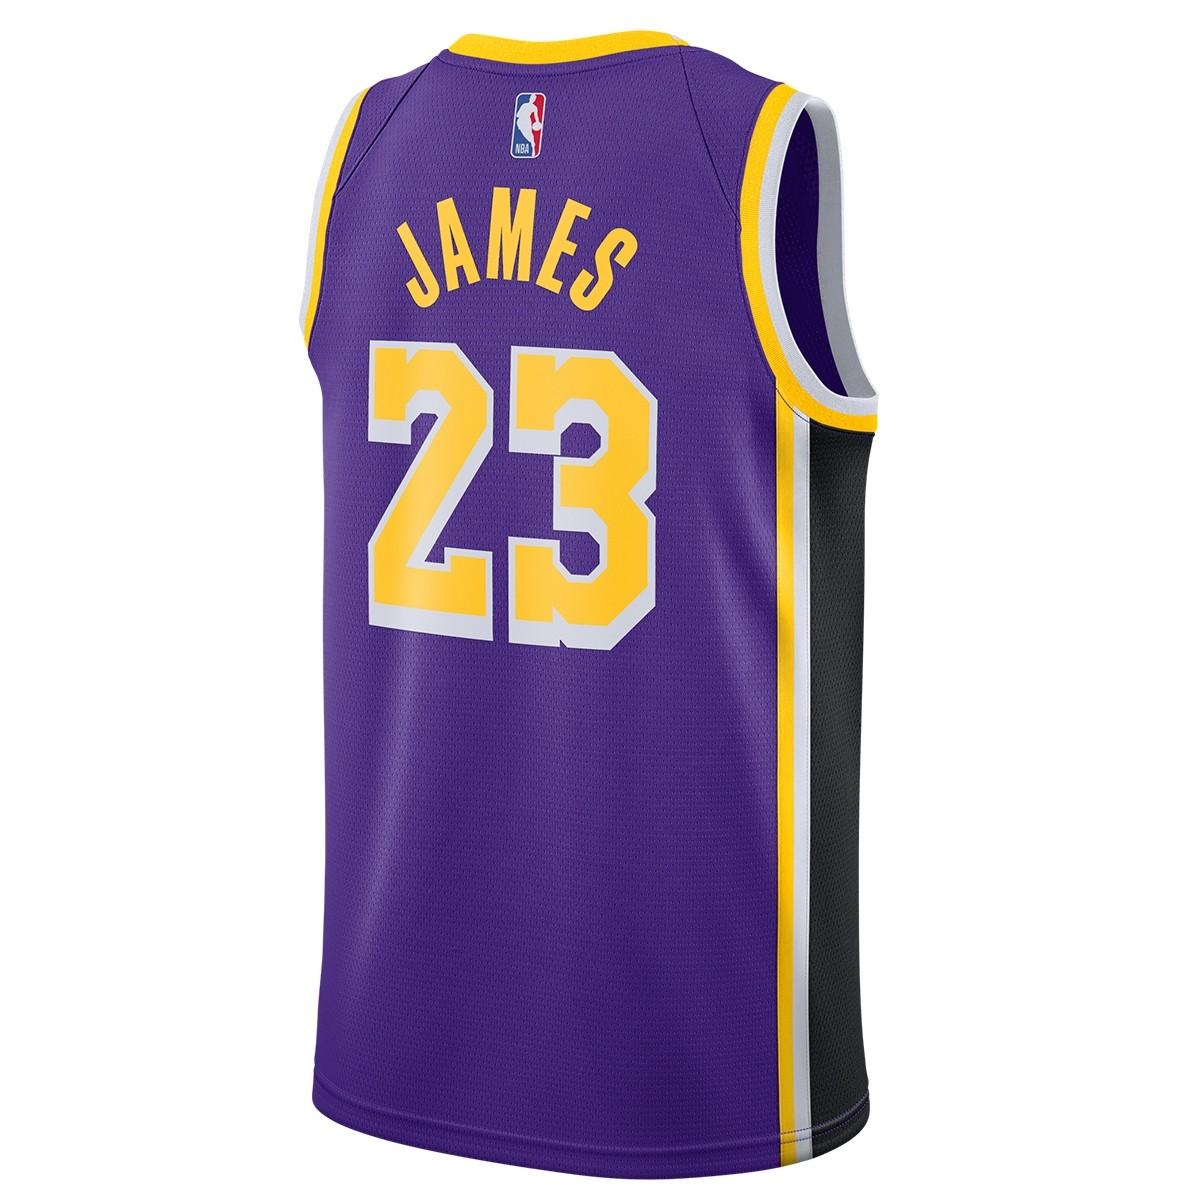 Nike NBA Lakers Swingman Jersey James ' Statement Edition'-AA7097-514